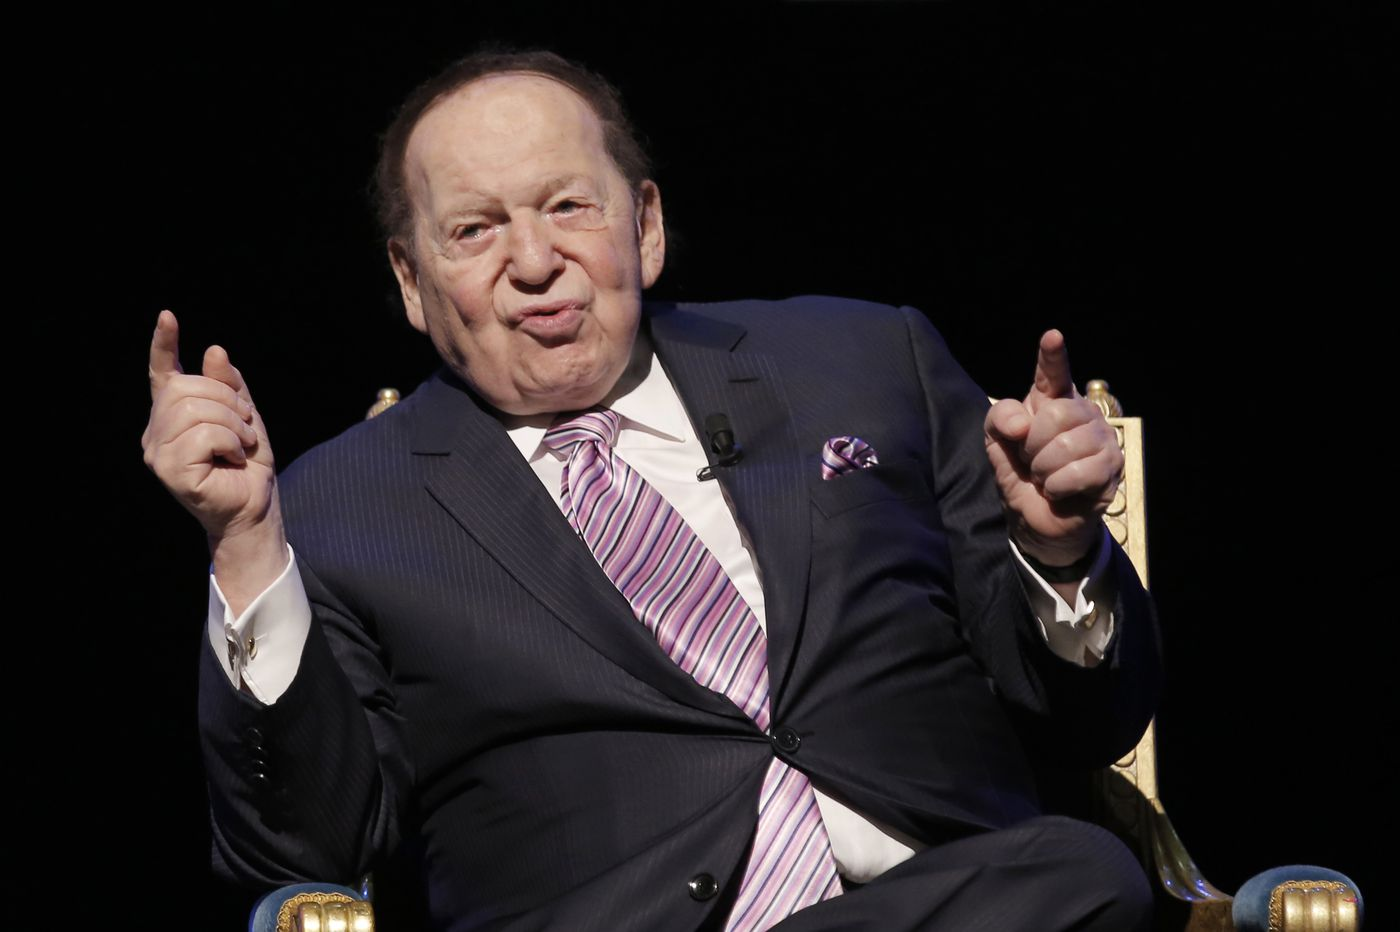 Sheldon Adelson, Las Vegas Sands founder and GOP power broker, dies